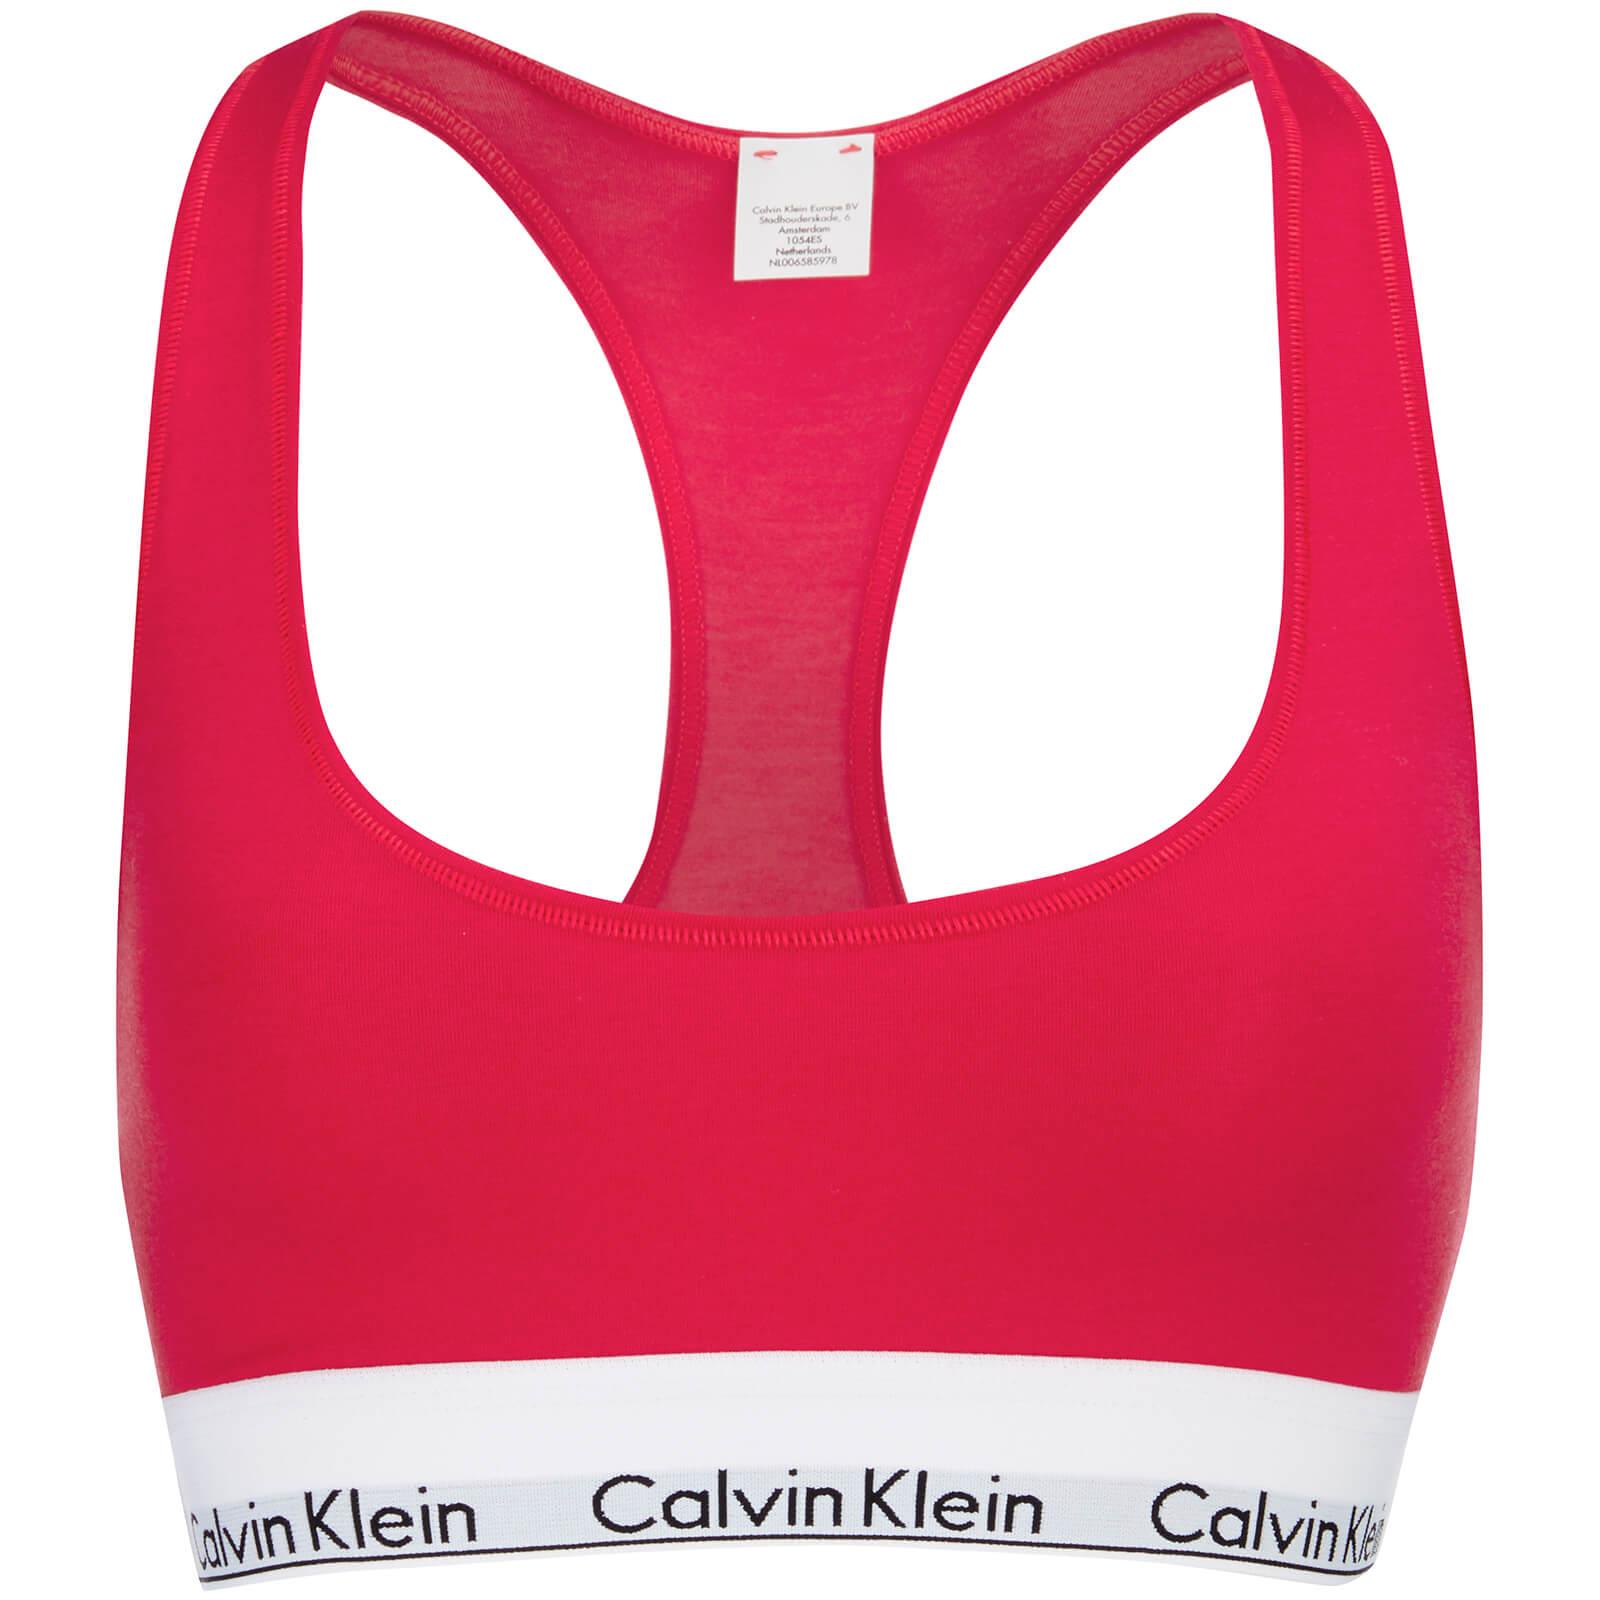 755e7166d981fa Calvin Klein Women s Modern Cotton Bralette - Evocative Red - Free UK  Delivery over £50